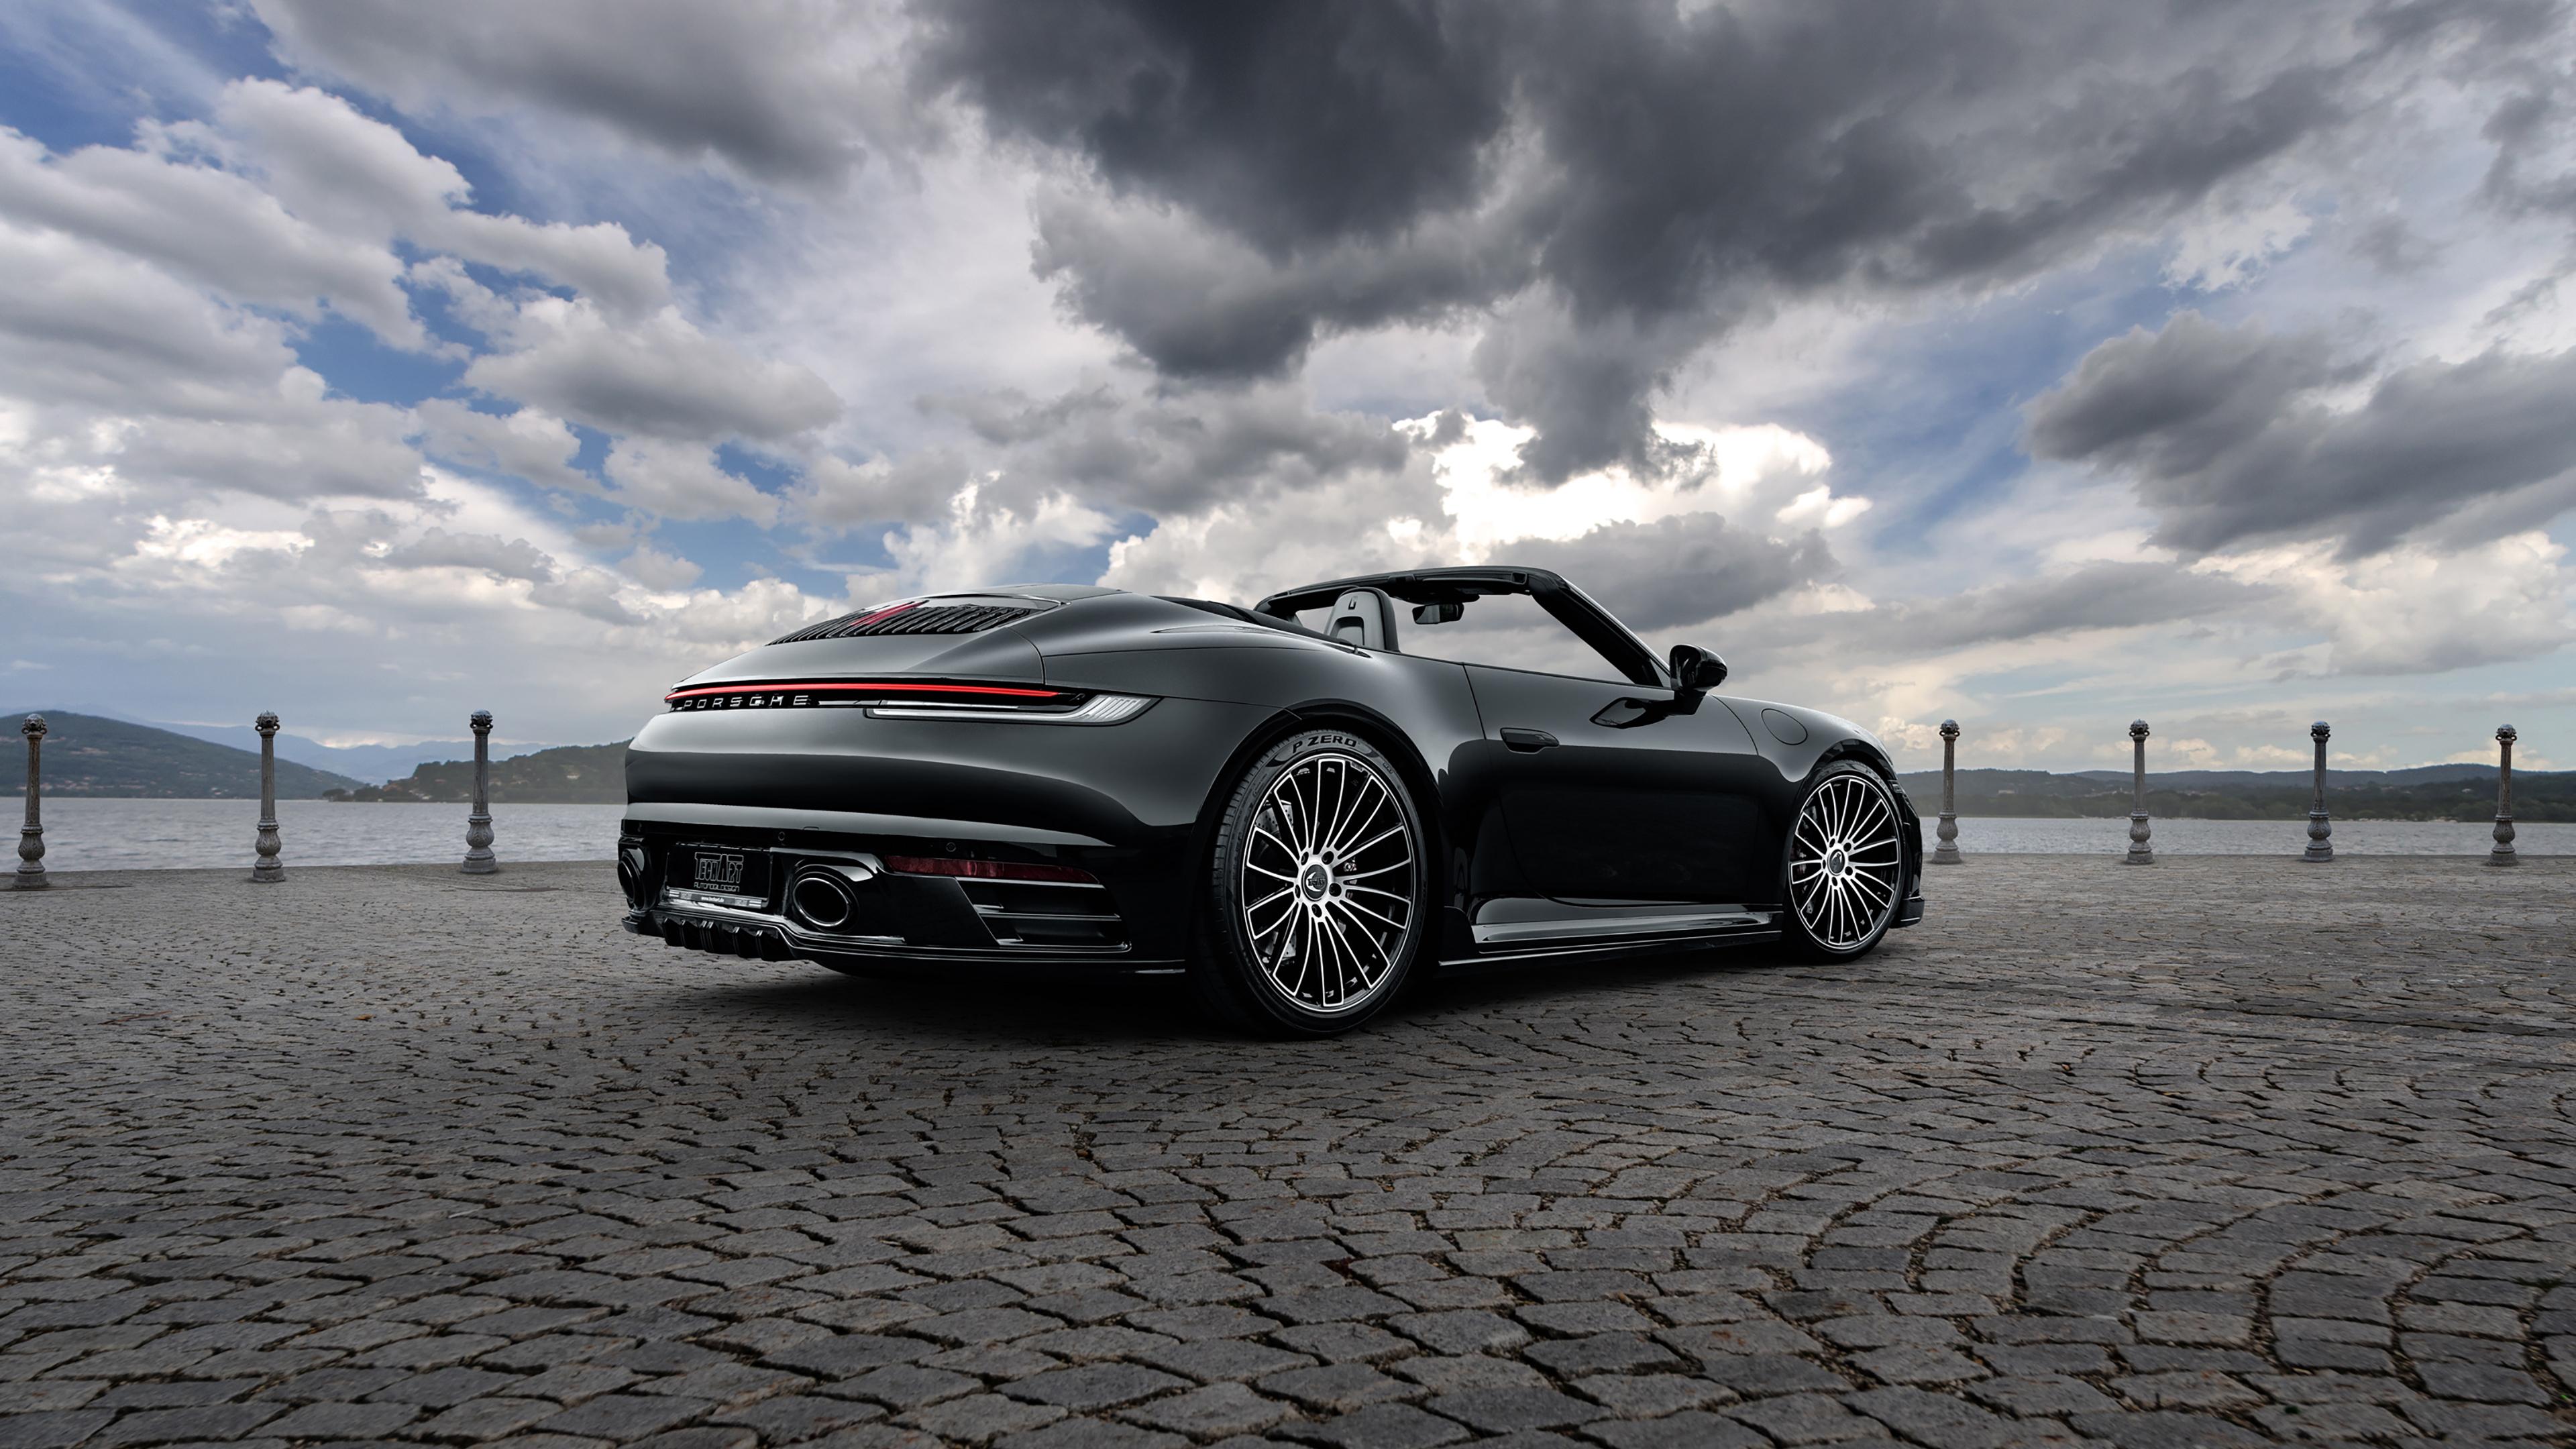 TechArt Porsche 911 Carrera 4S Cabriolet 2020 4K Wallpaper ...